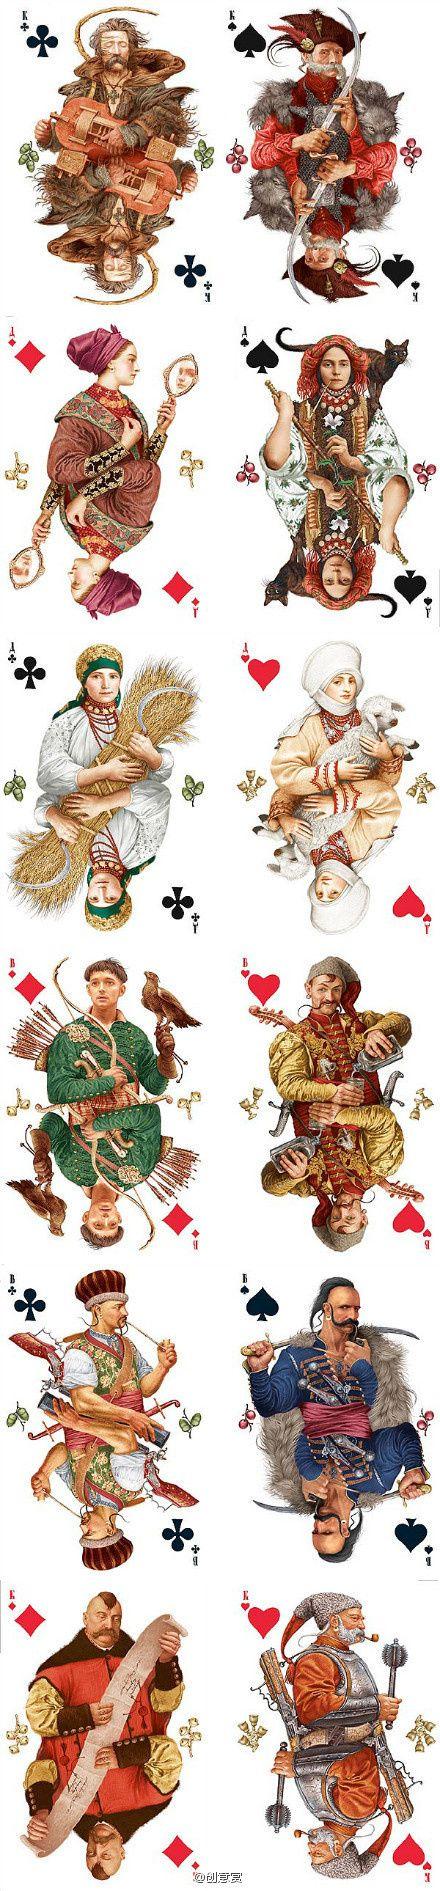 Playing Cards - Ukrainian Playing Cards - playingcards, playingcardsart…